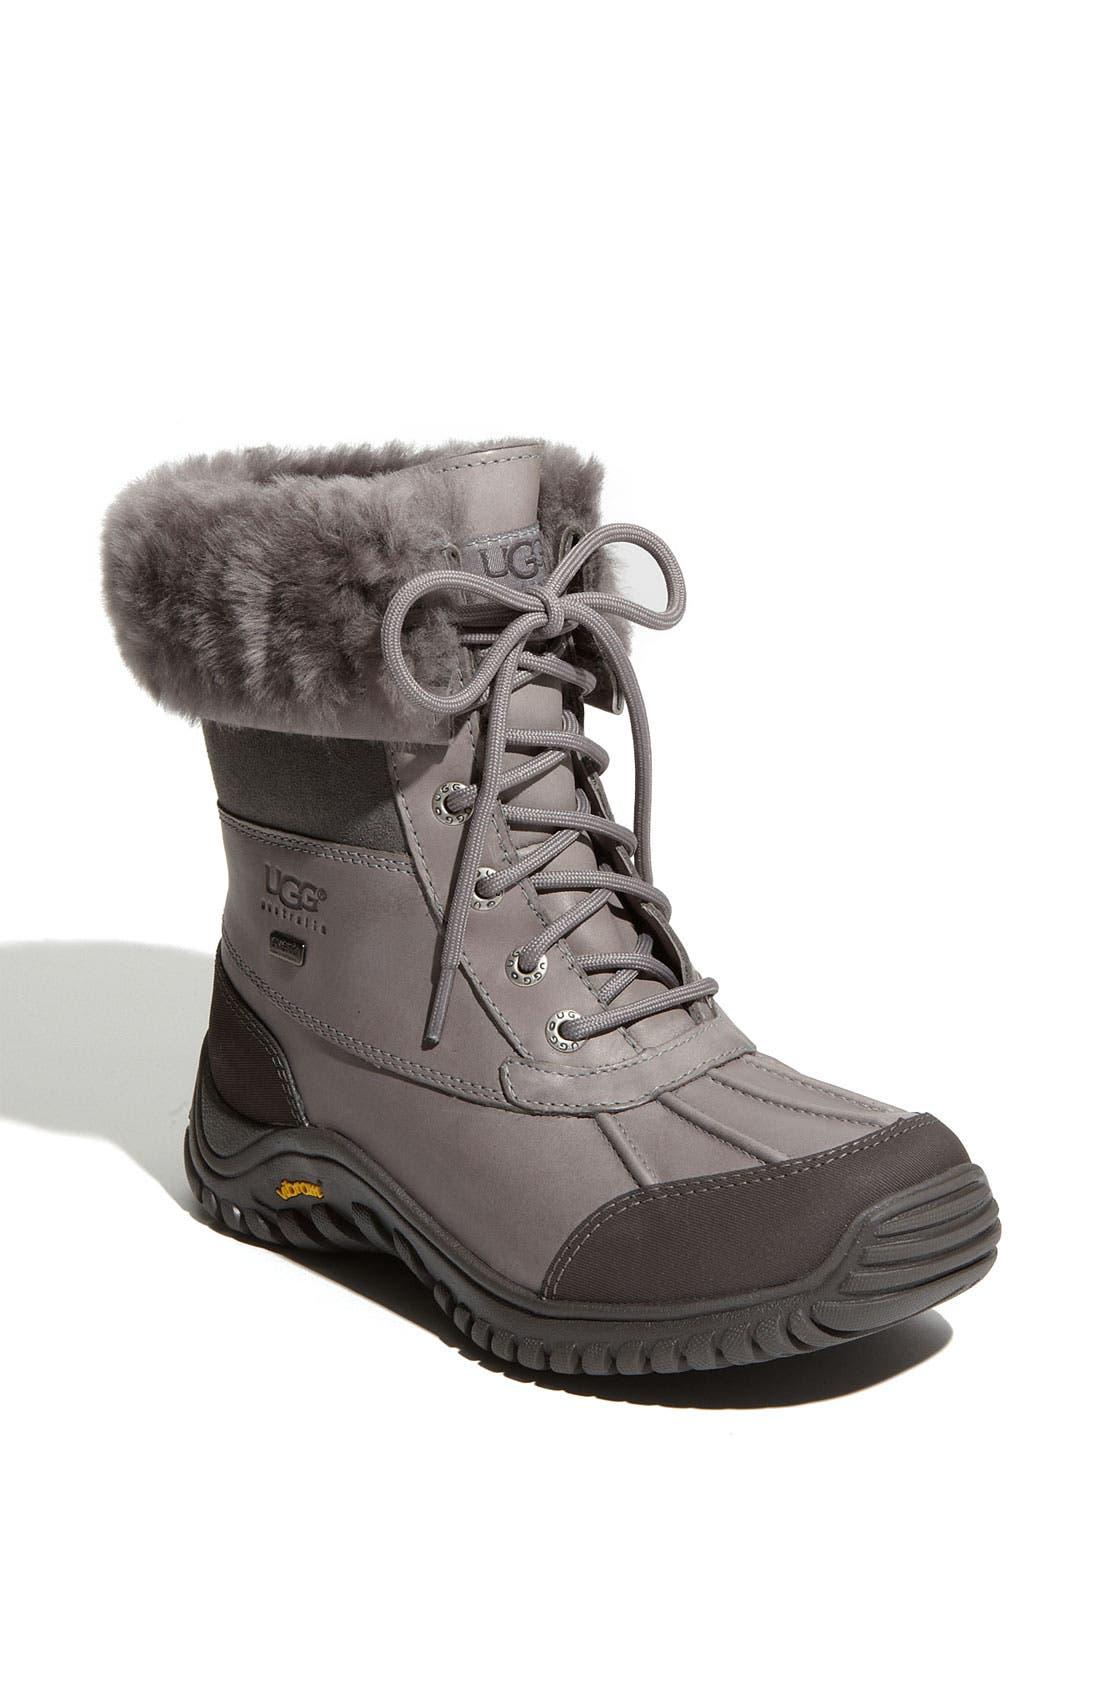 Adirondack II Waterproof Boot,                         Main,                         color, Grey